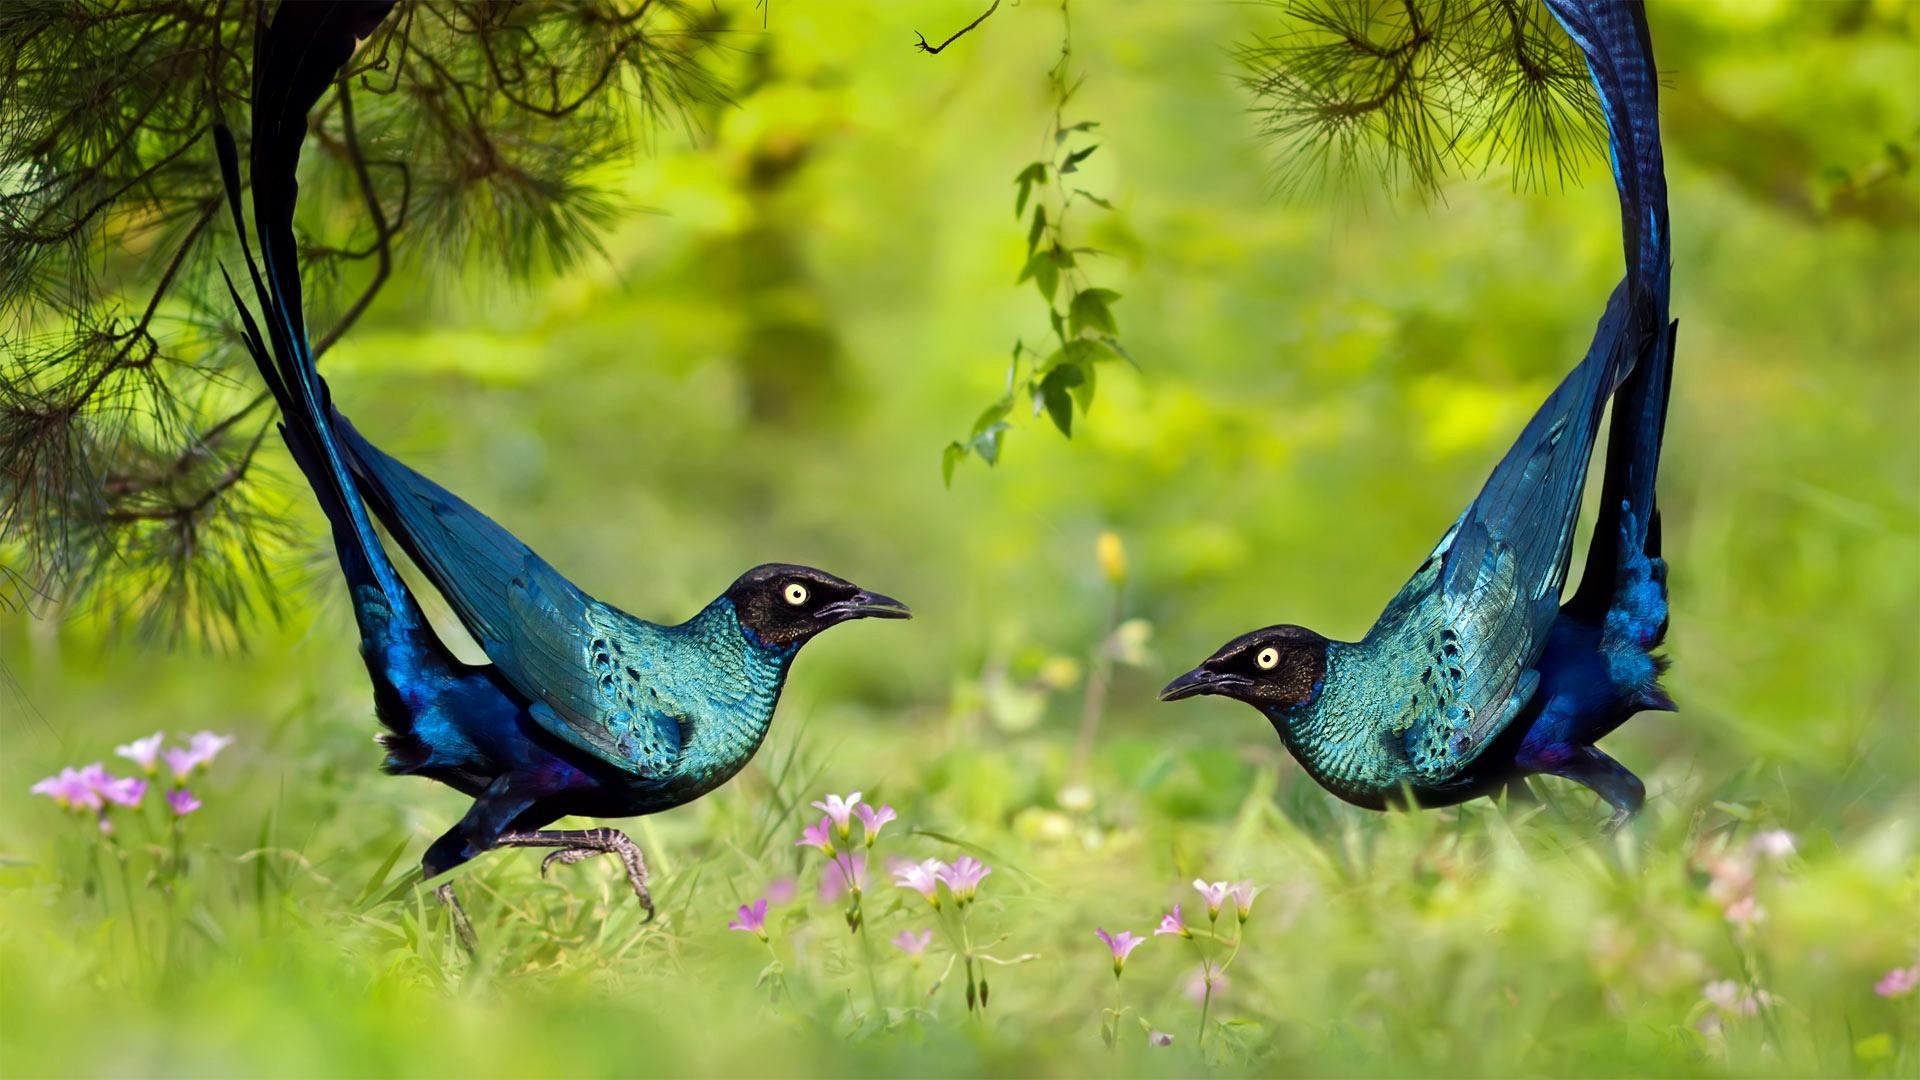 Long-tailed glossy starlings wallpaper